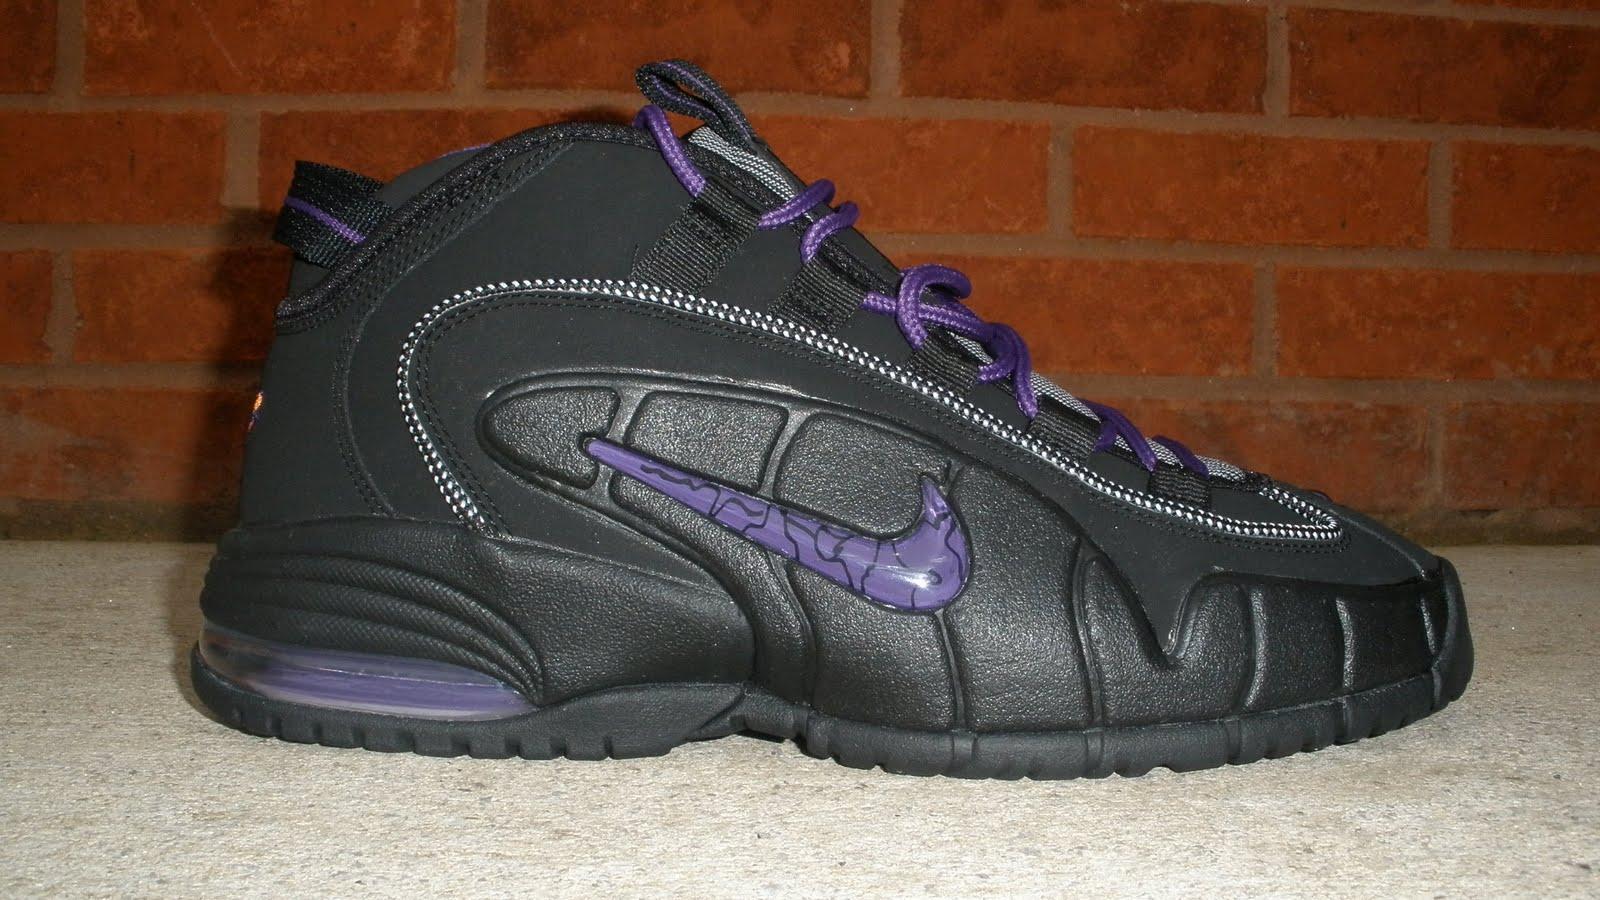 Bama Kicks  Nike Air Max Penny Black Purple In Stock HD Wallpaper